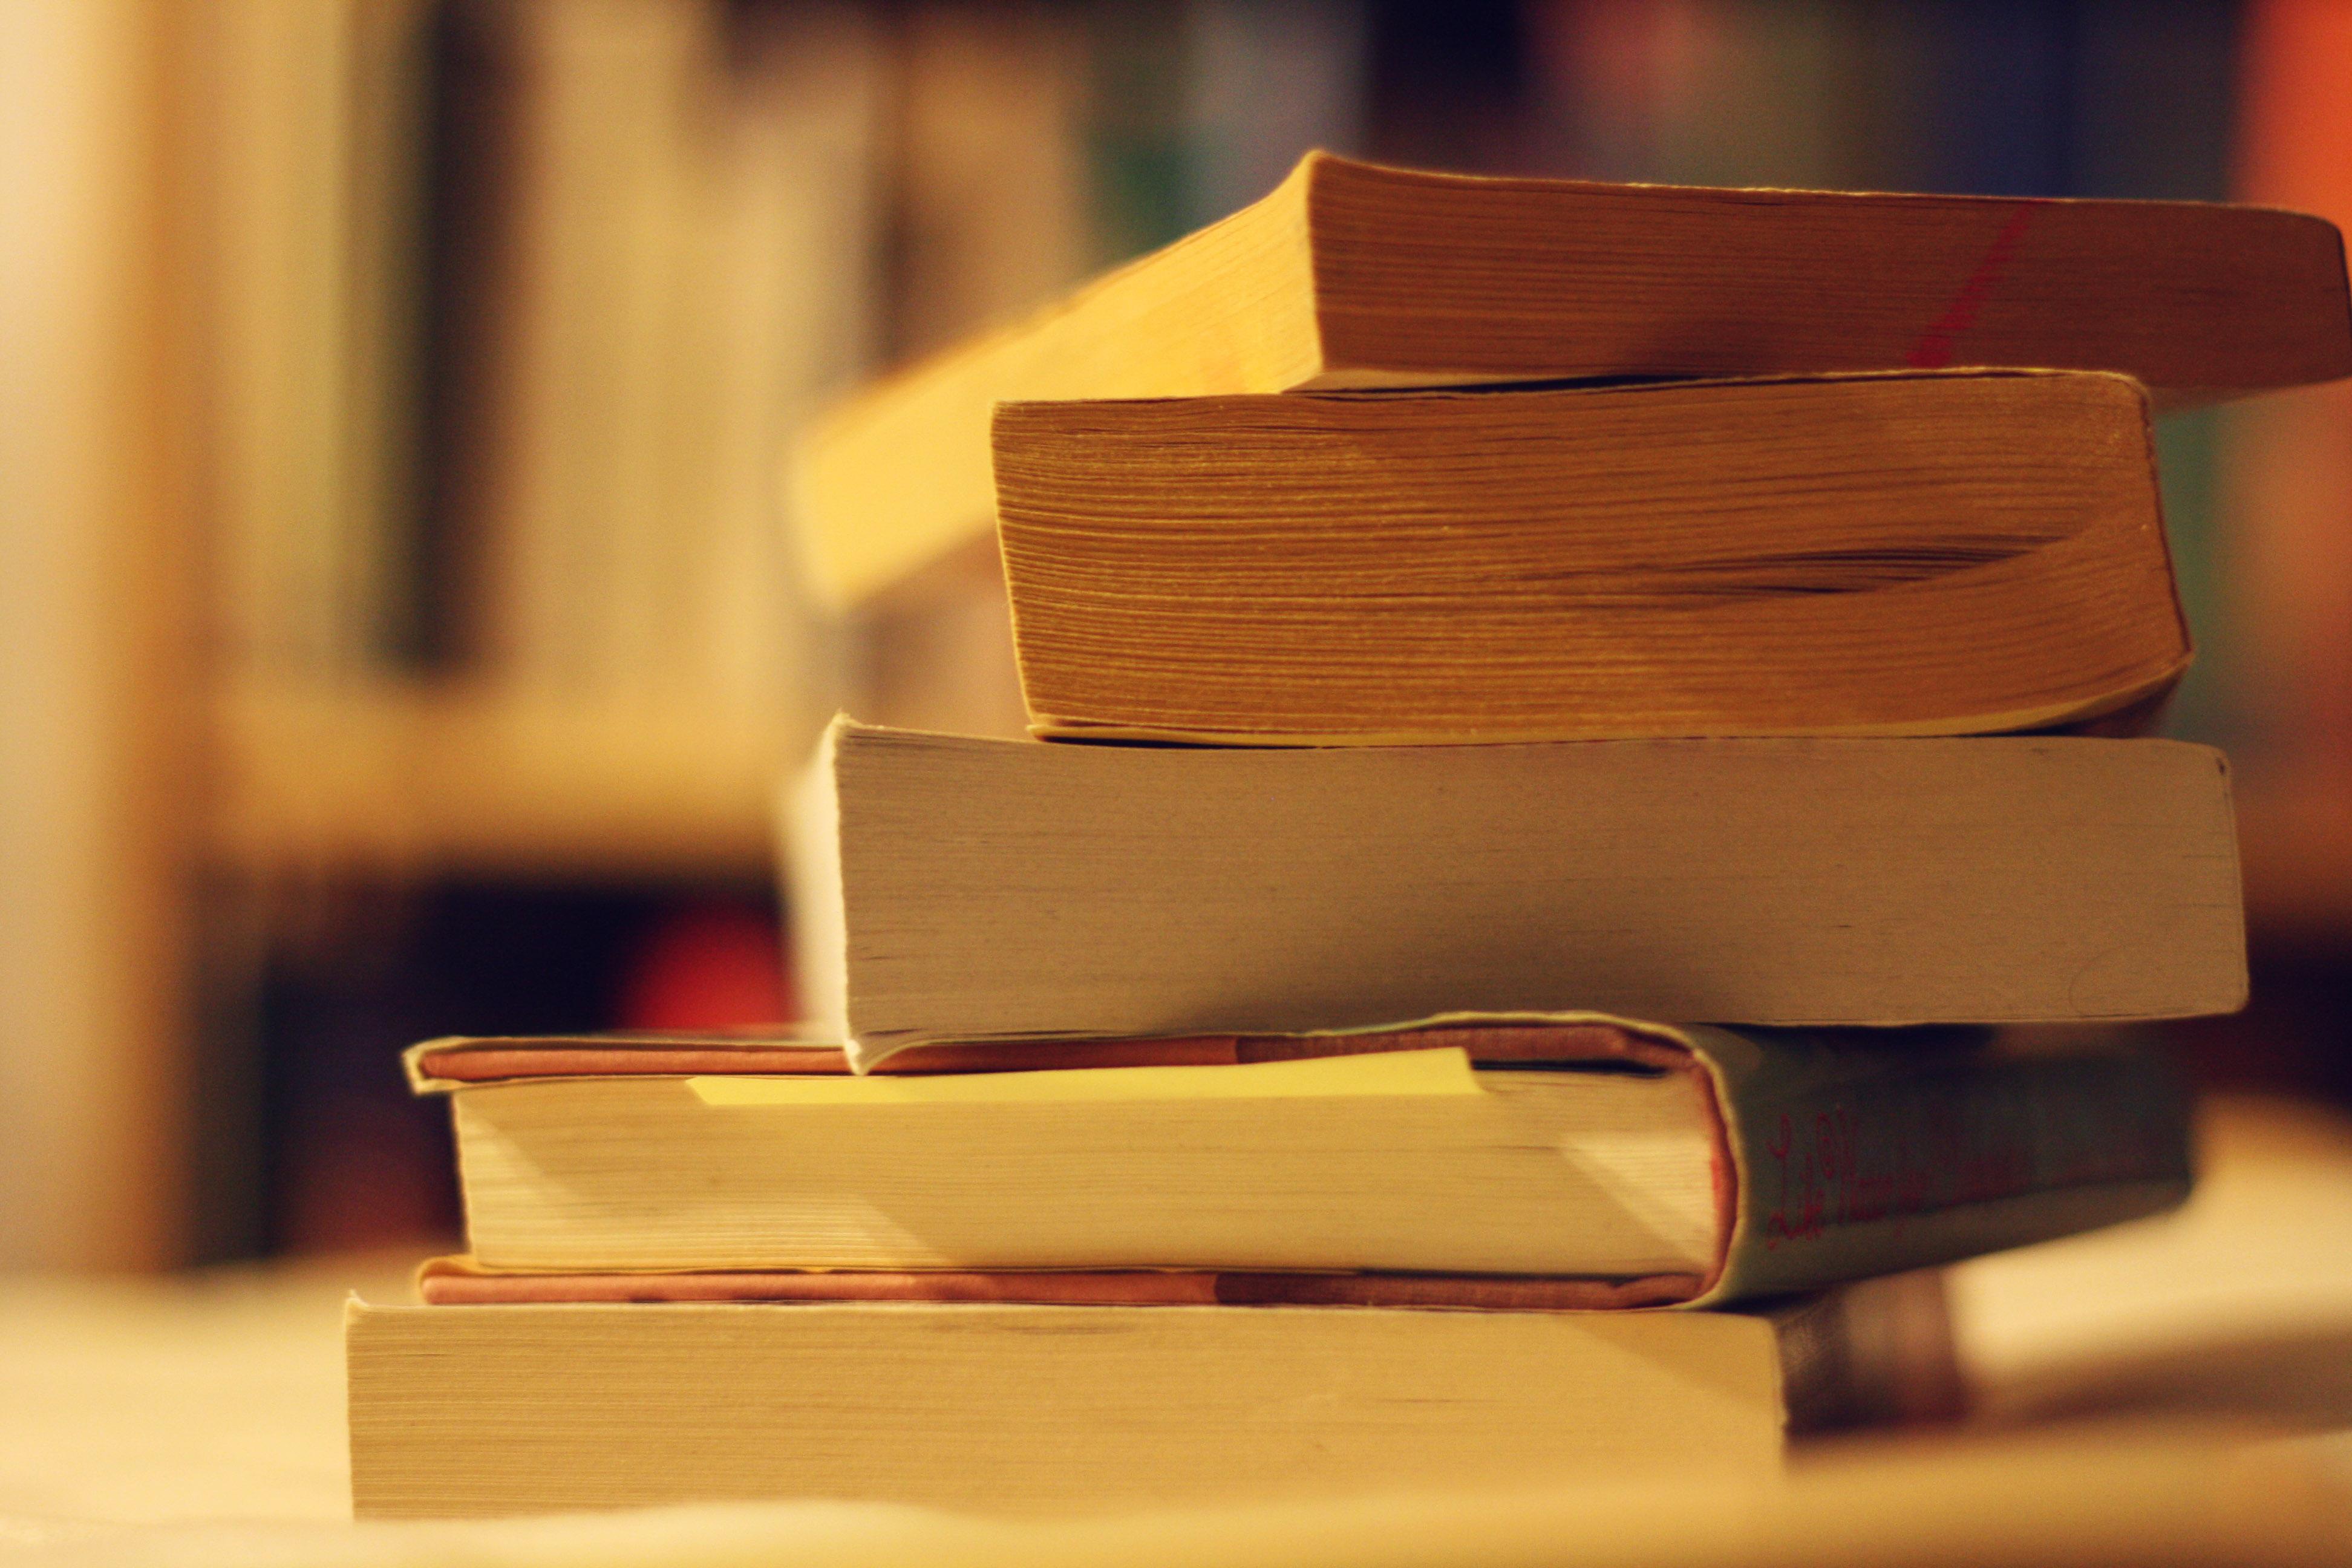 My Summer Reading List Thumbnail